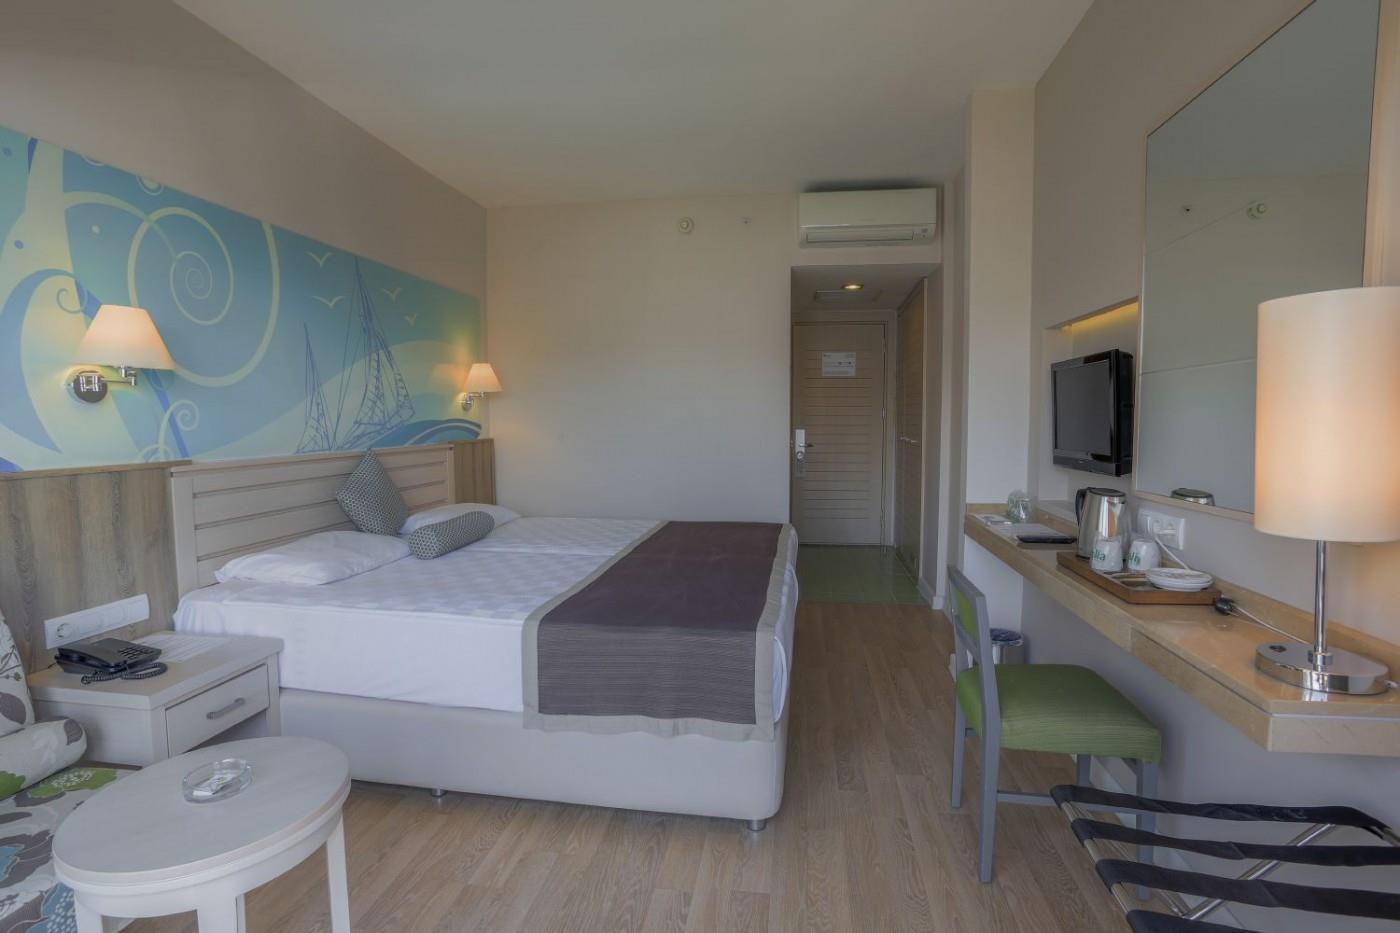 http://www.orextravel.sk/OREX/hotelphotos/thalia-unique-area-0032.jpg